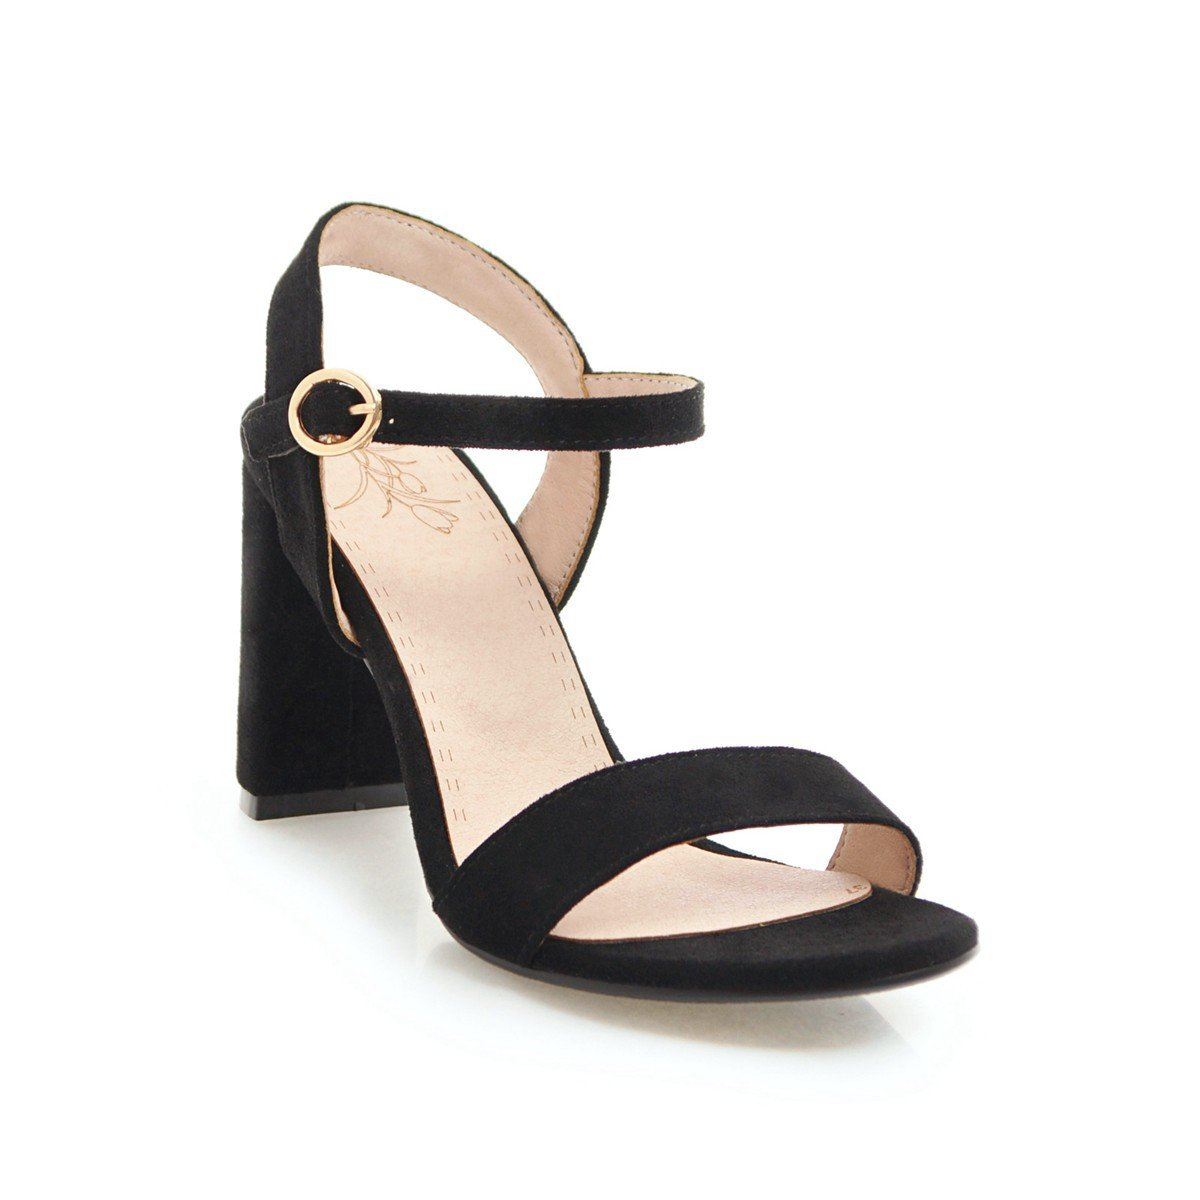 Unbekannt Damen Sandalen Open Toe Toe Toe Dick mit Schnalle Wilde Große Römische Schuhe Schwarz 39 d3d0fa